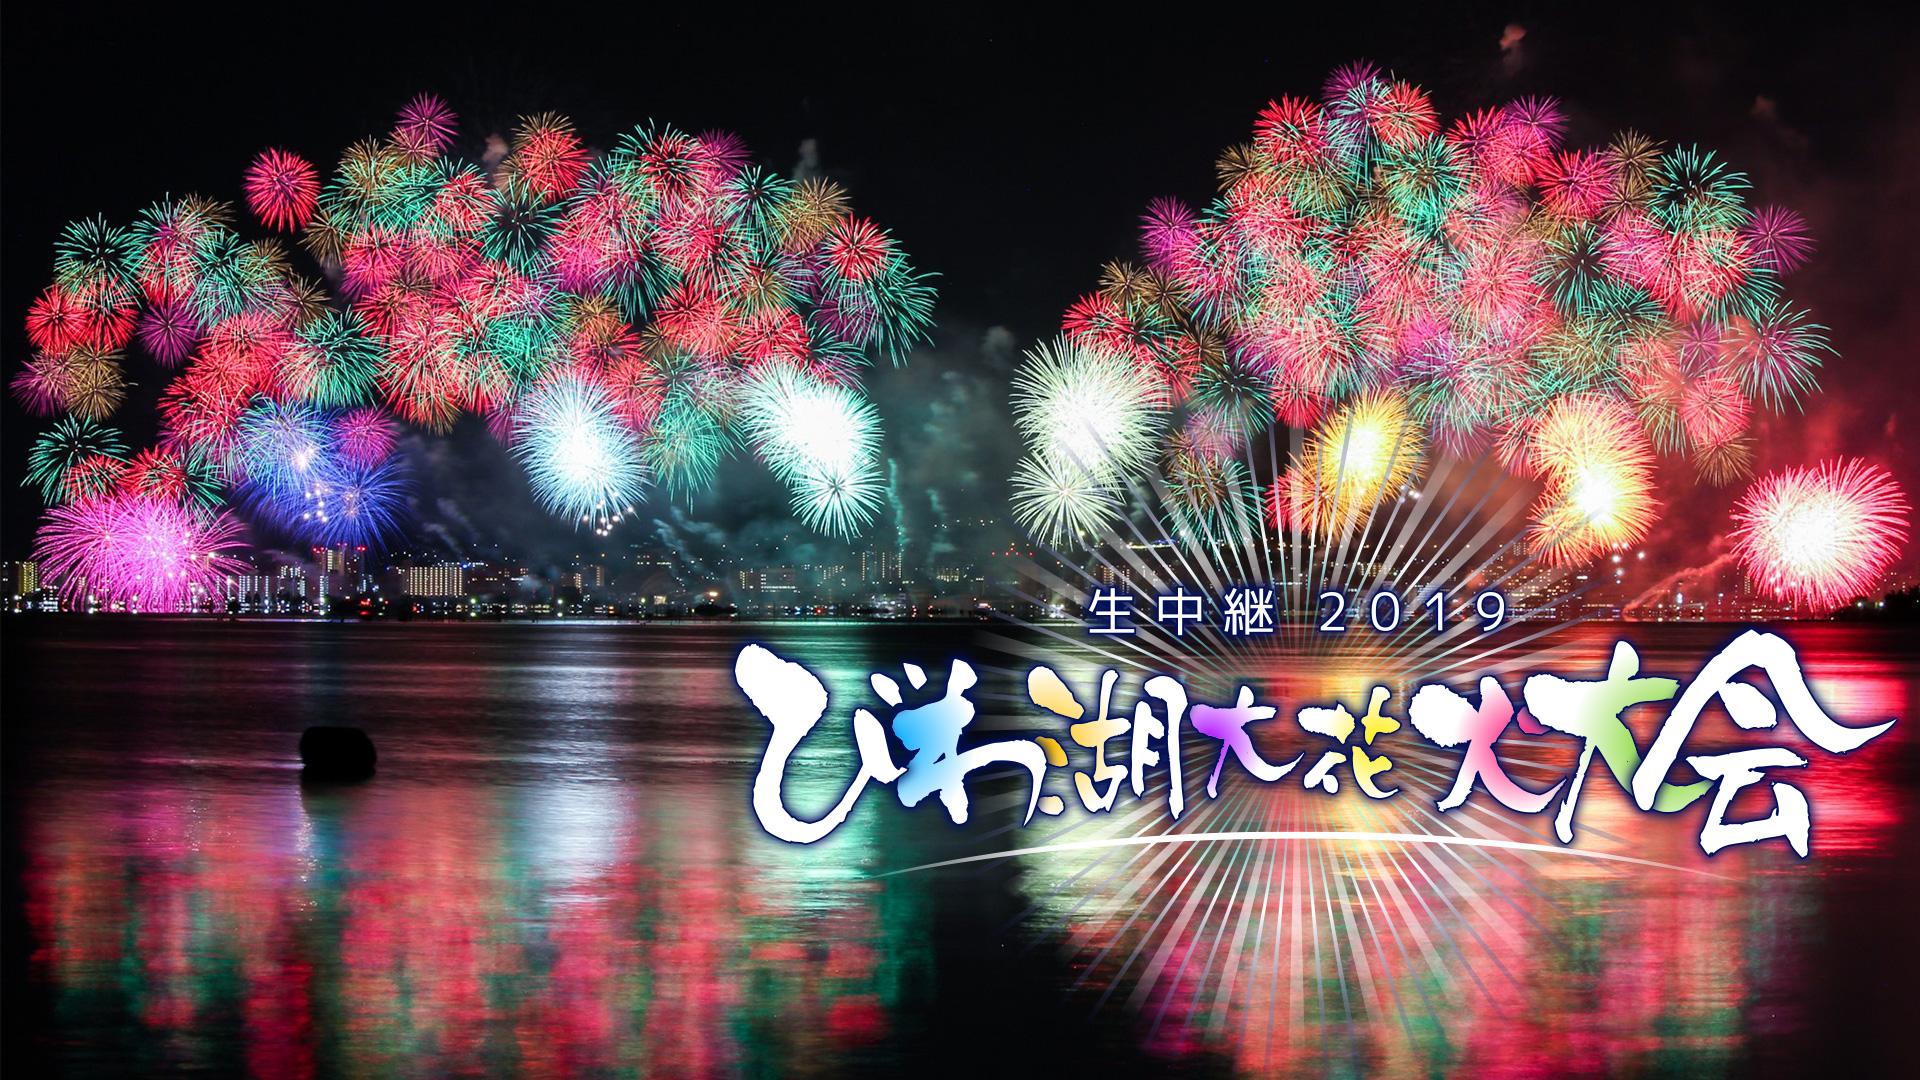 生中継 2019びわ湖大花火大会